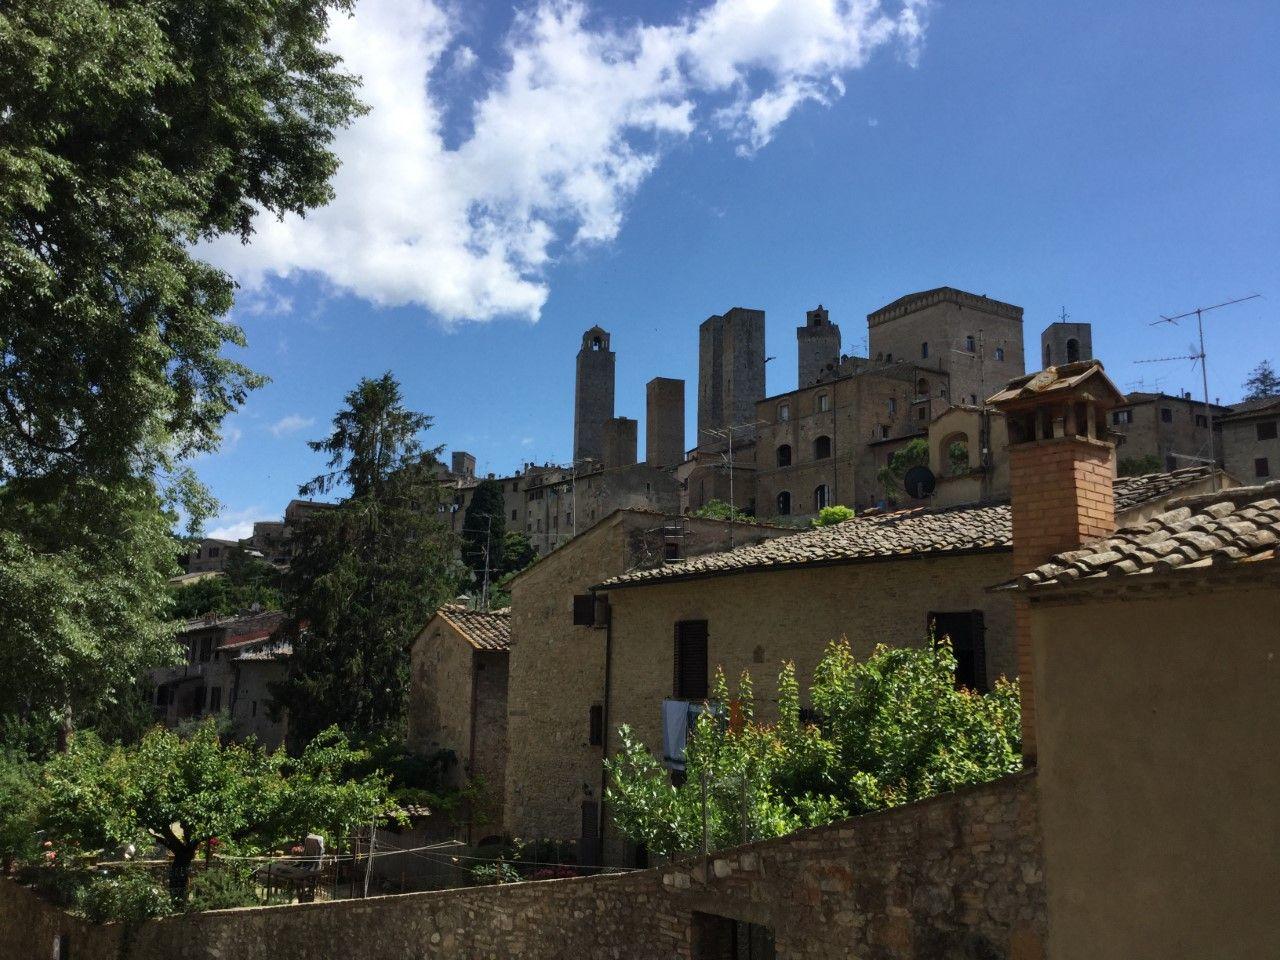 the towers of san gimignano in tuscany, italy